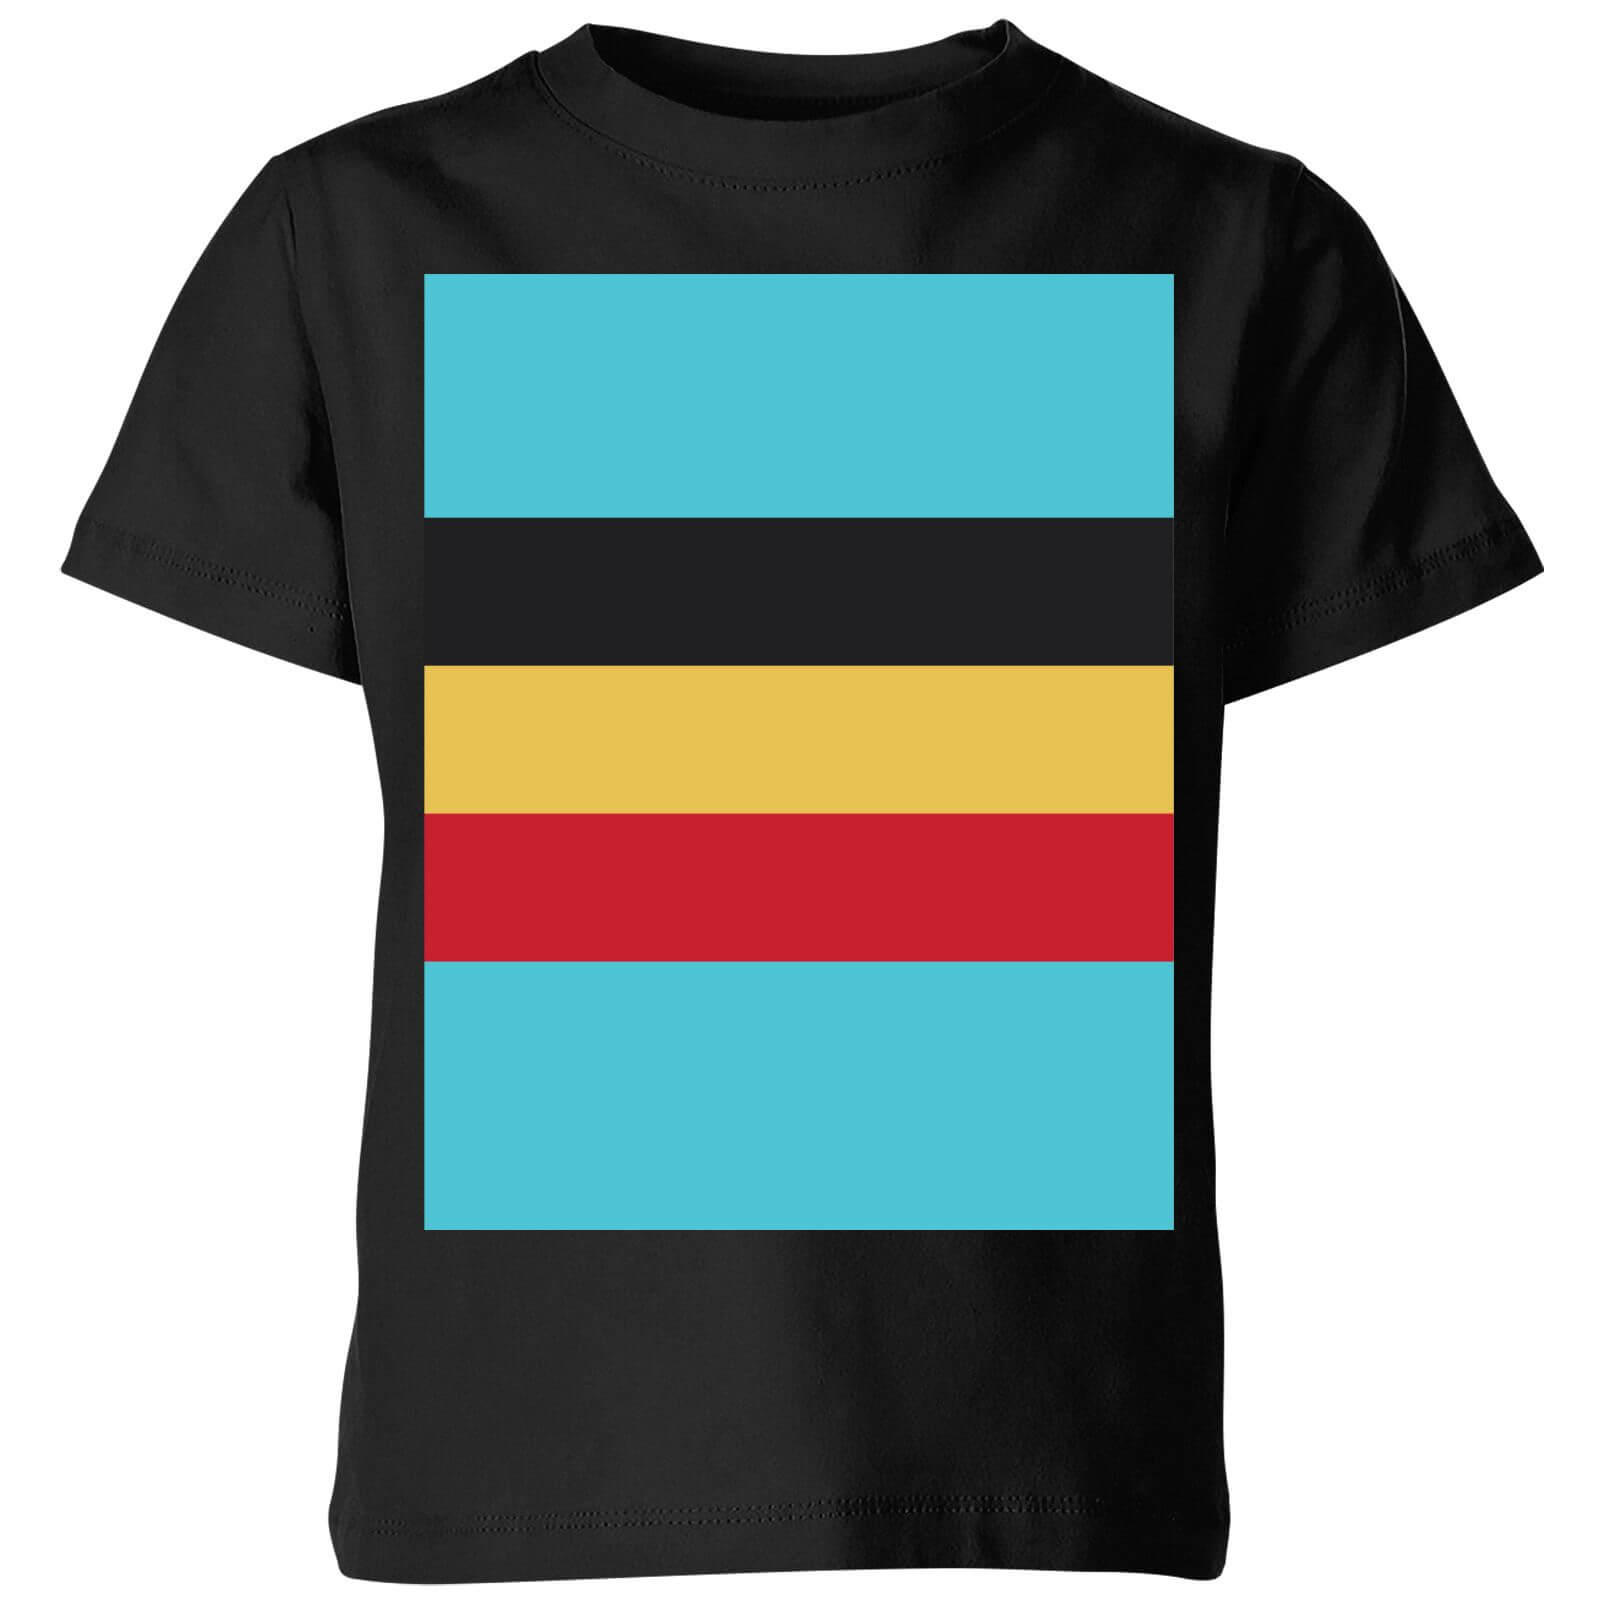 Summit Finish Belgium Flag Kids T-shirt - Black - 7-8 Years - Black